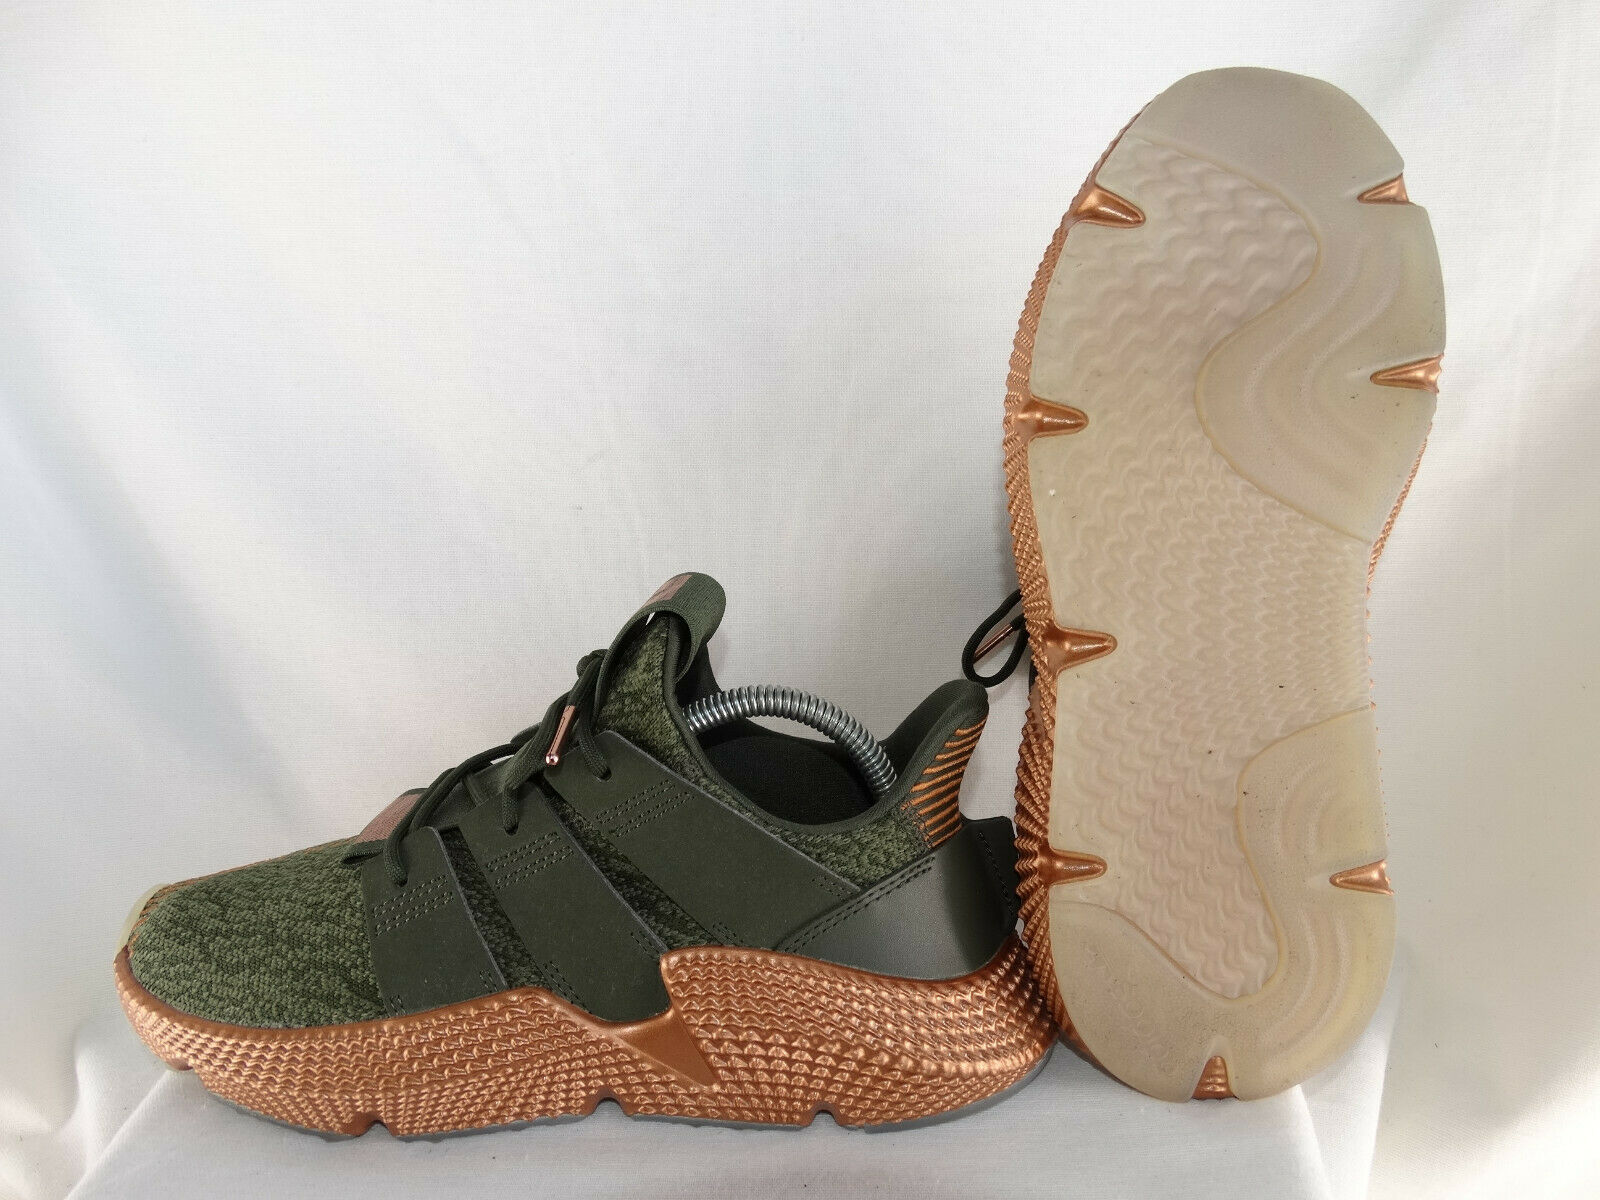 Adidas Prophere Damen Turnschuhe DA9616 oliv-kupfer EU 38 2 3 UK 5,5